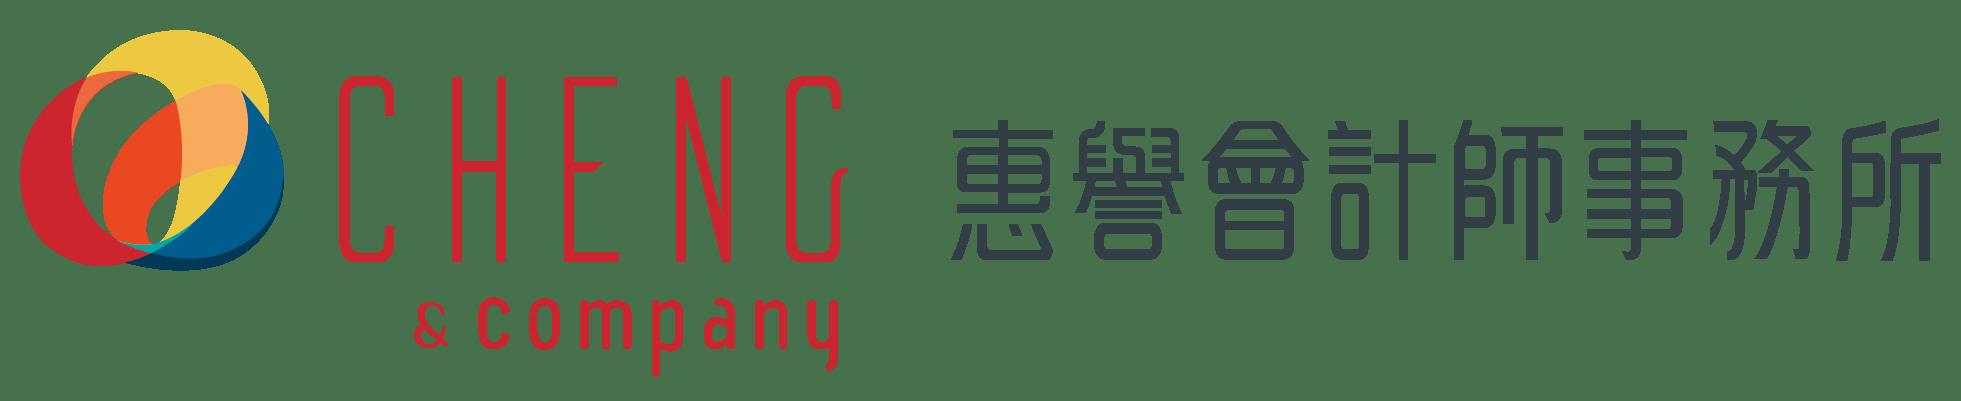 Cheng&Company 惠譽會計師事務所